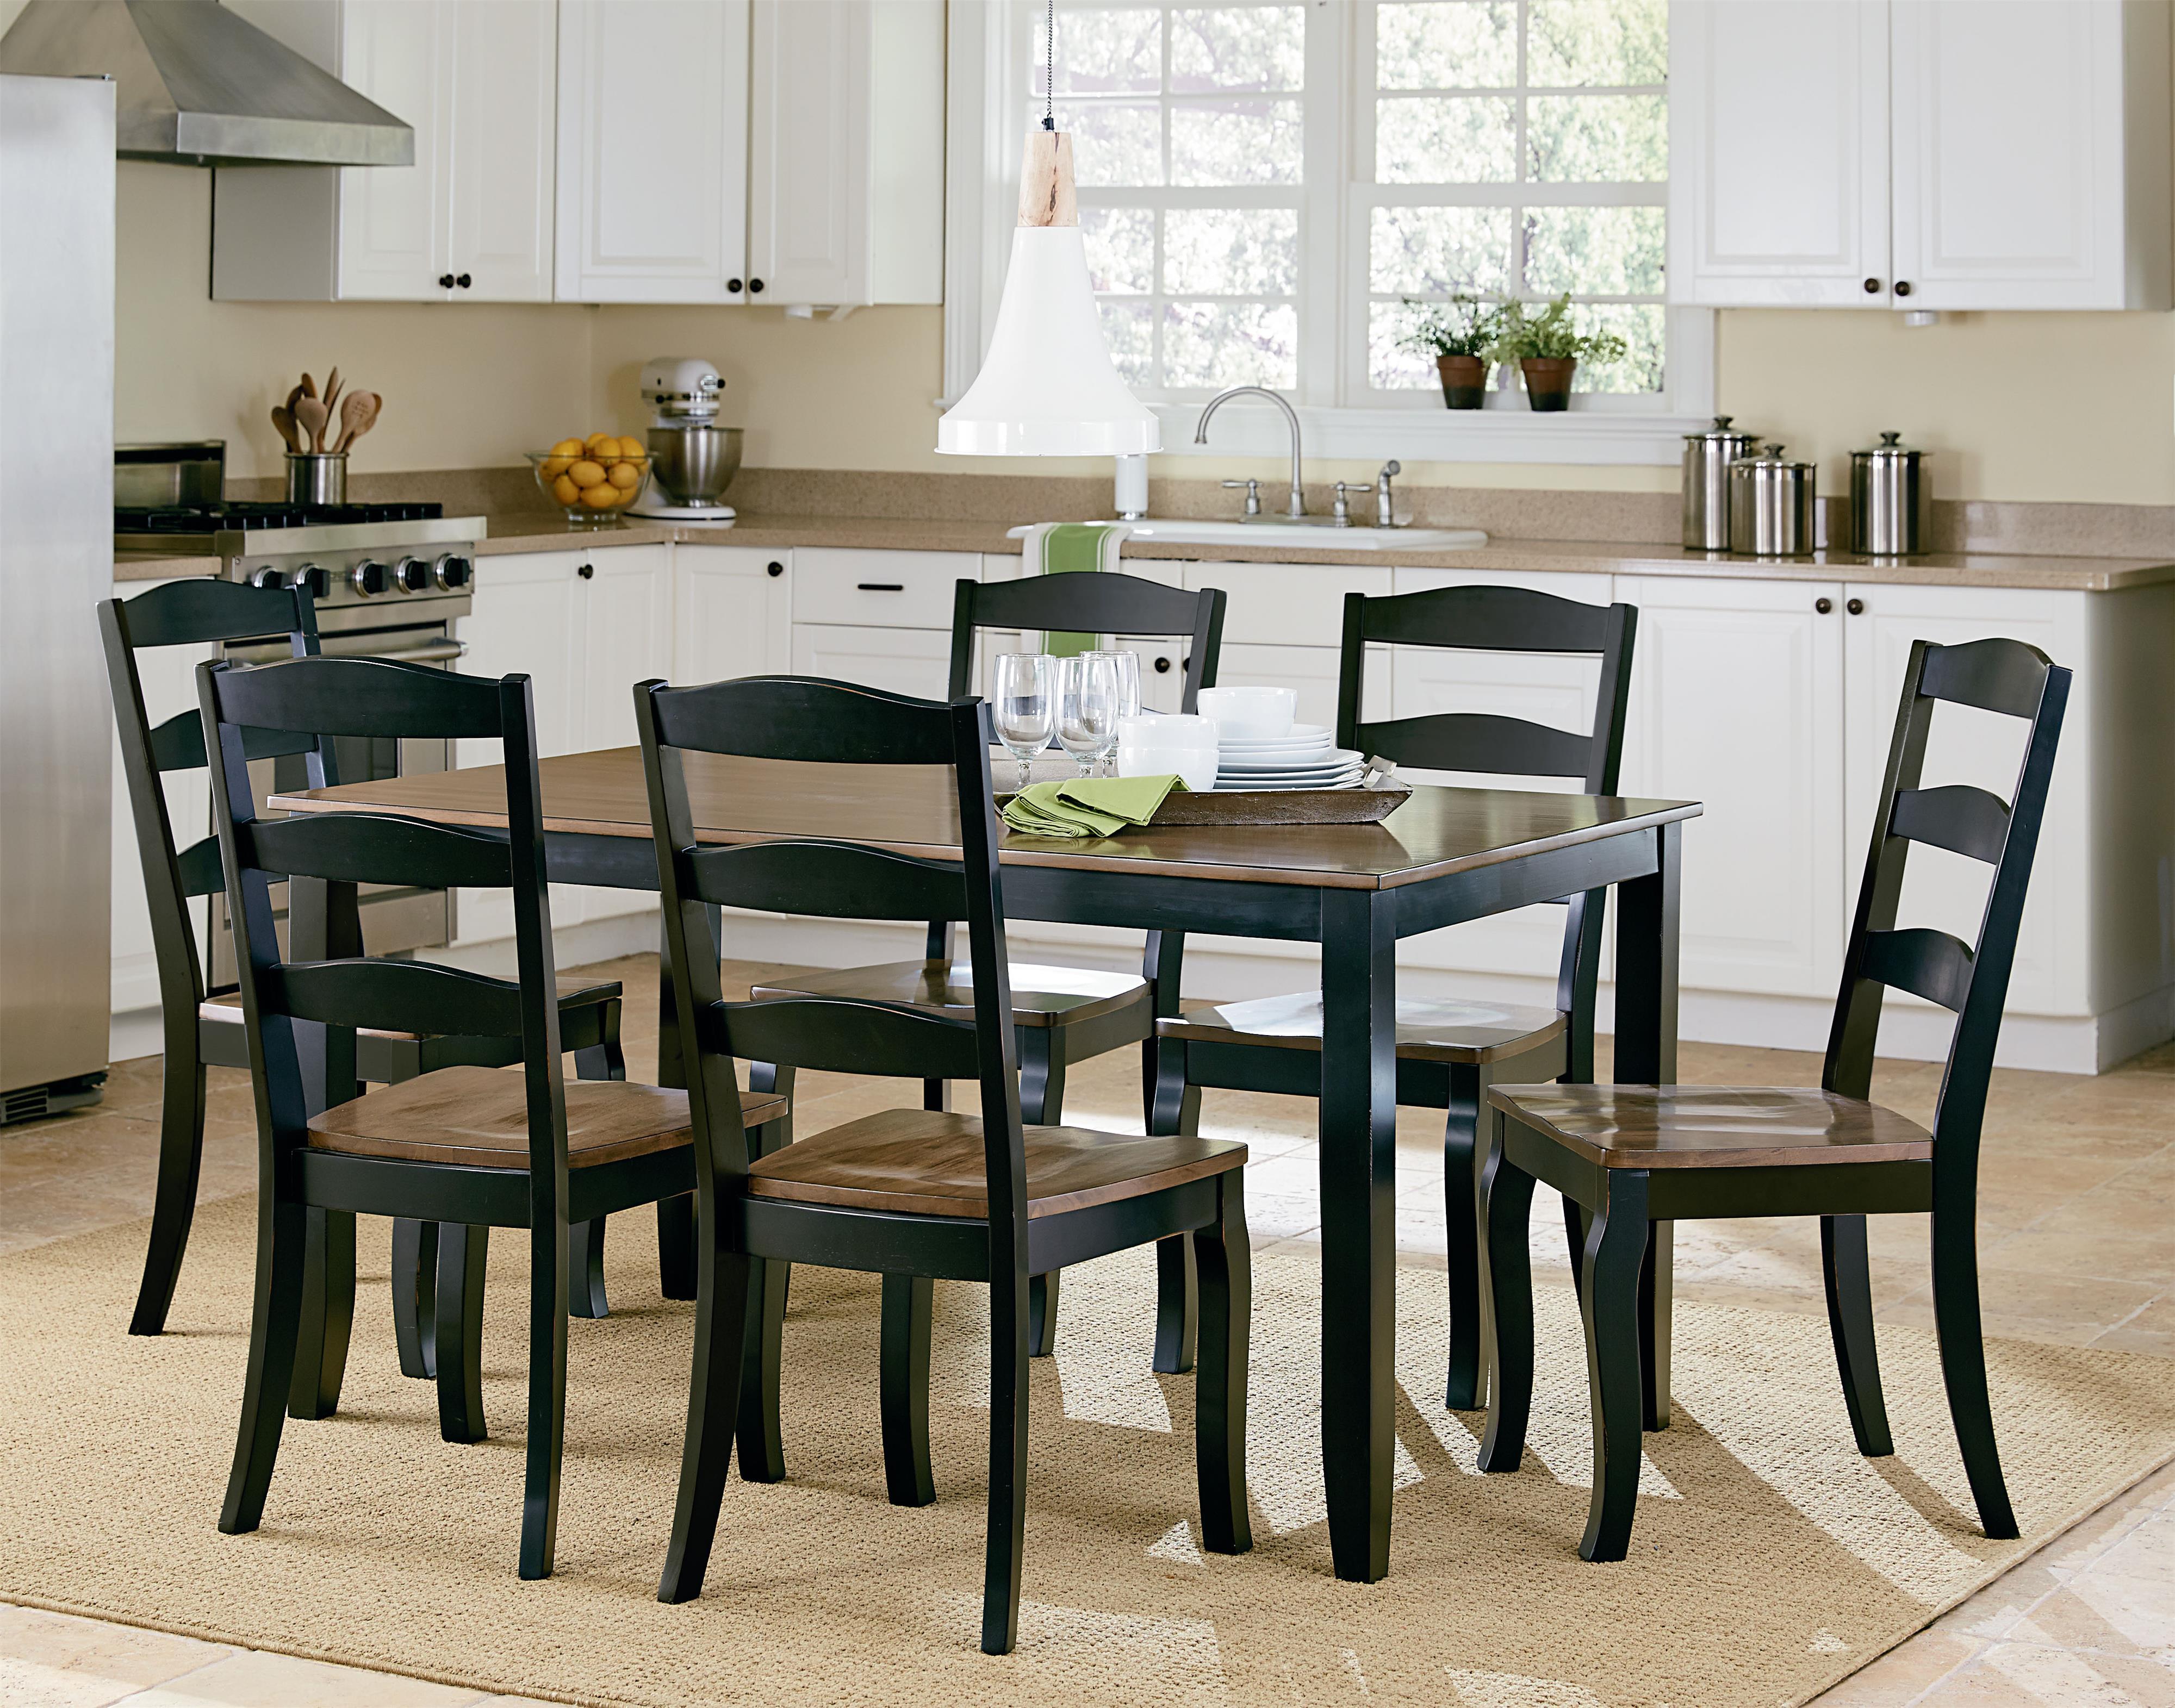 Standard Furniture Highland Black Table Set With Six Side Chairs | Standard  Furniture | Dining 7 (or More) Piece Sets Birmingham, Huntsville, Hoover,  ...